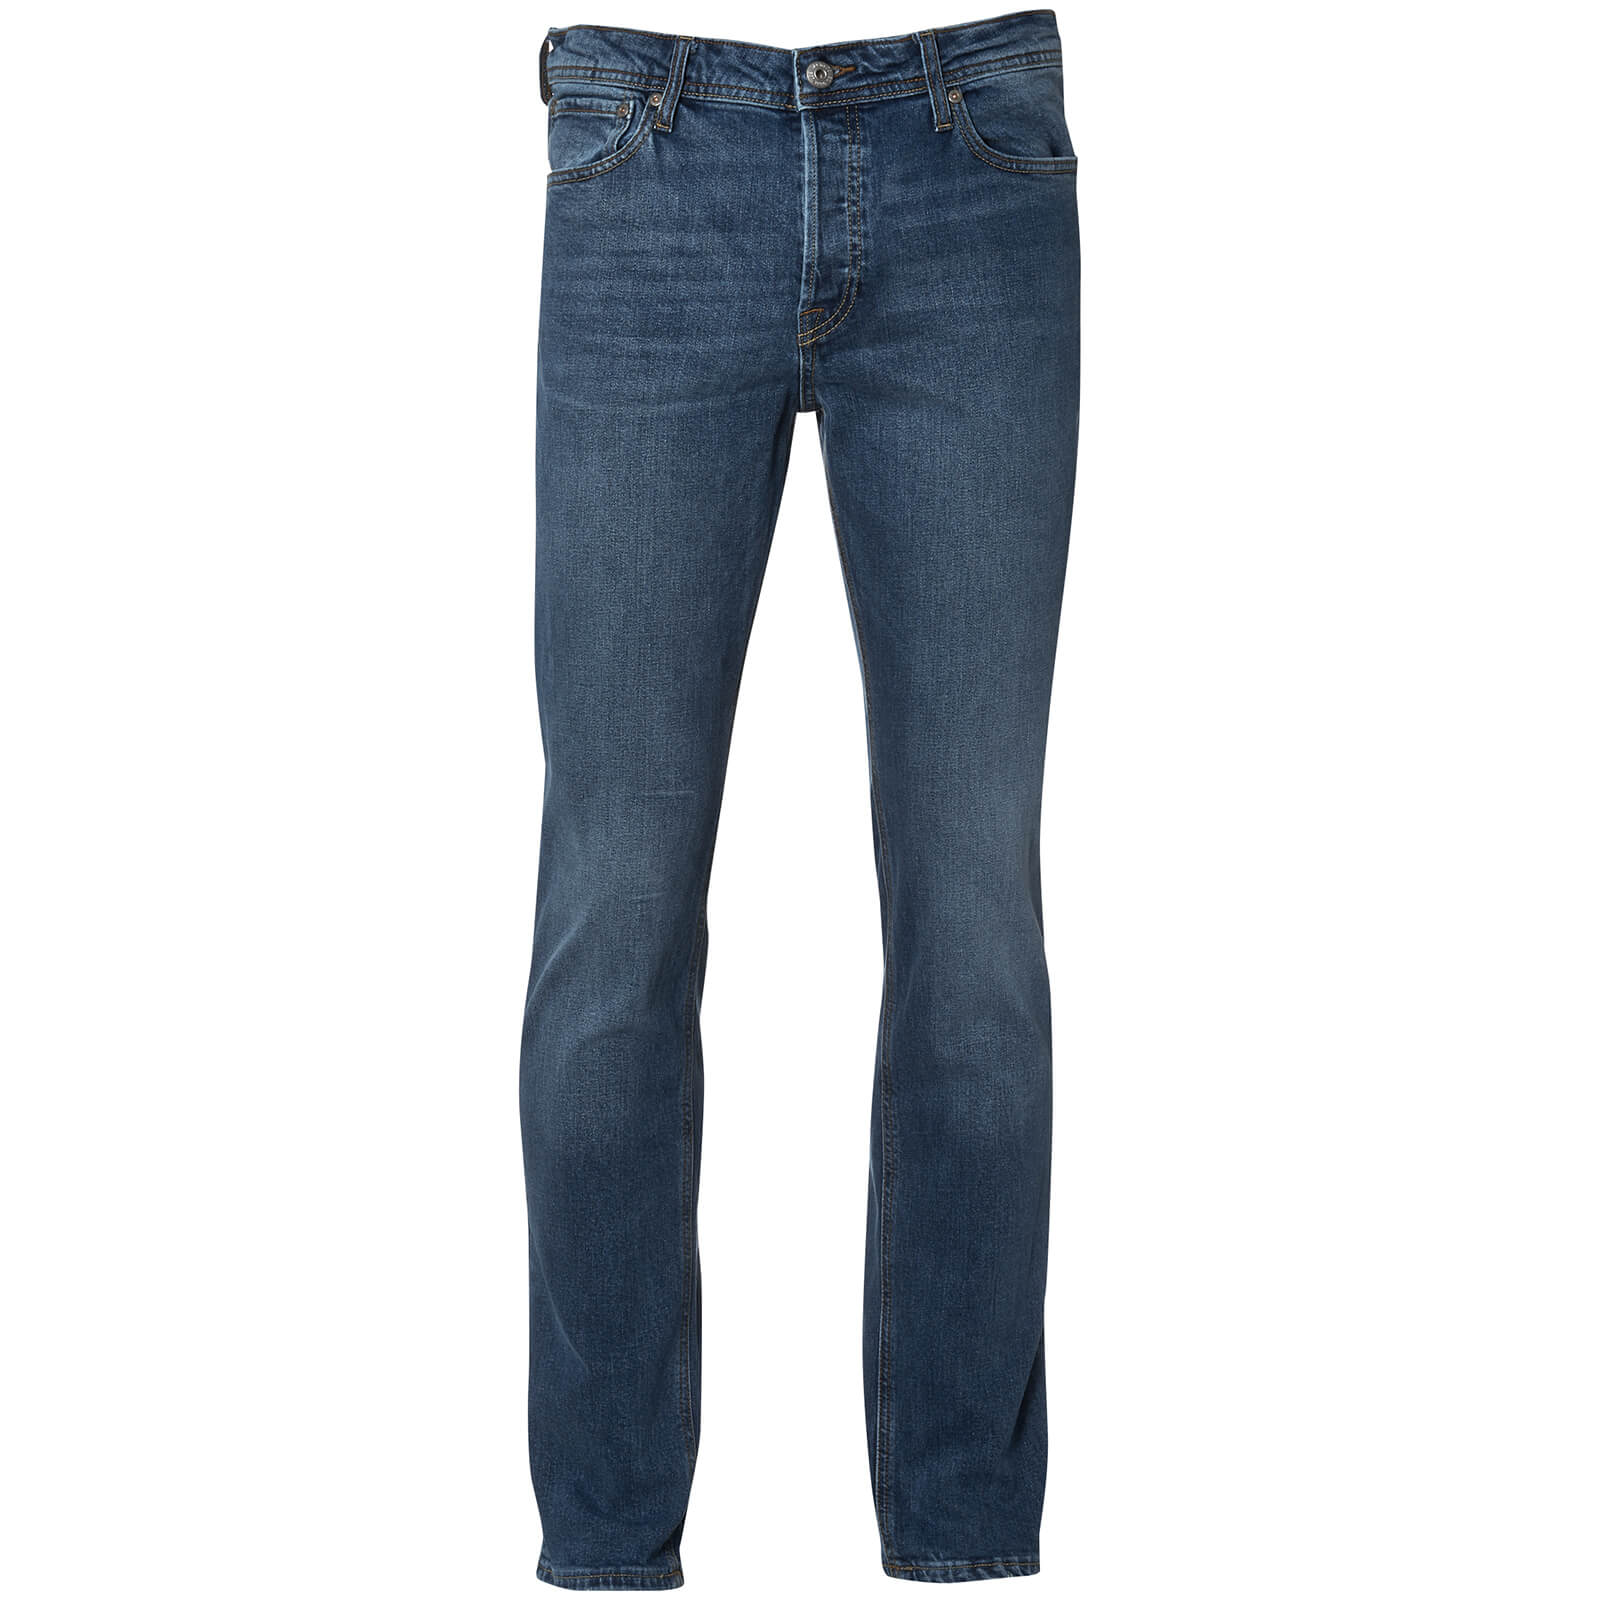 Mens Designer style Smith /& Jones Cotton Mid Blue Denims Regular Fit New FURIO